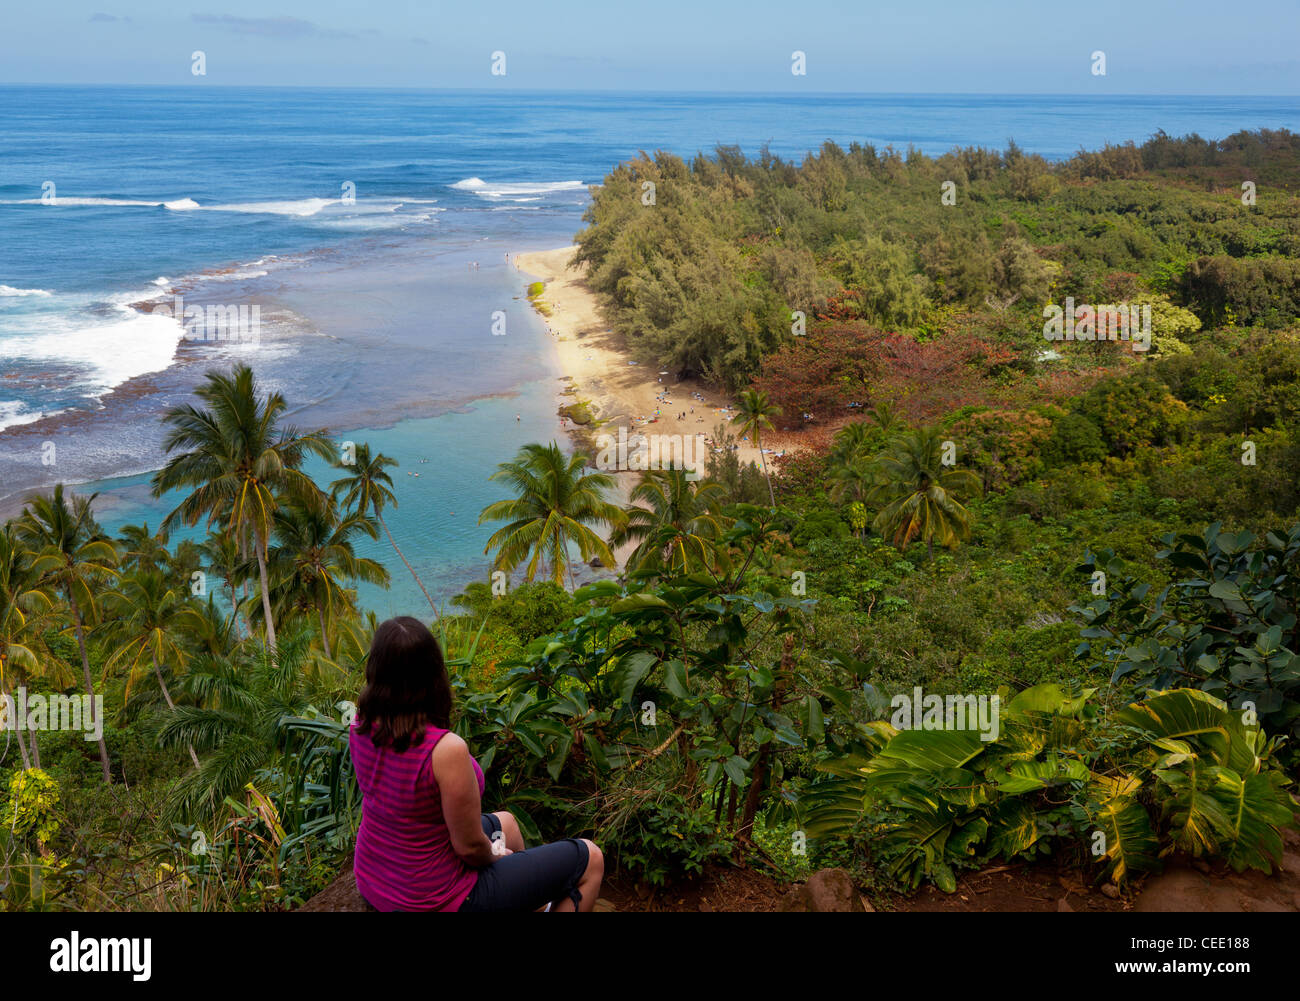 Female hiker overlooking Kee beach from Kalalau trail on Na Pali coast of Kauai, Hawaii - Stock Image